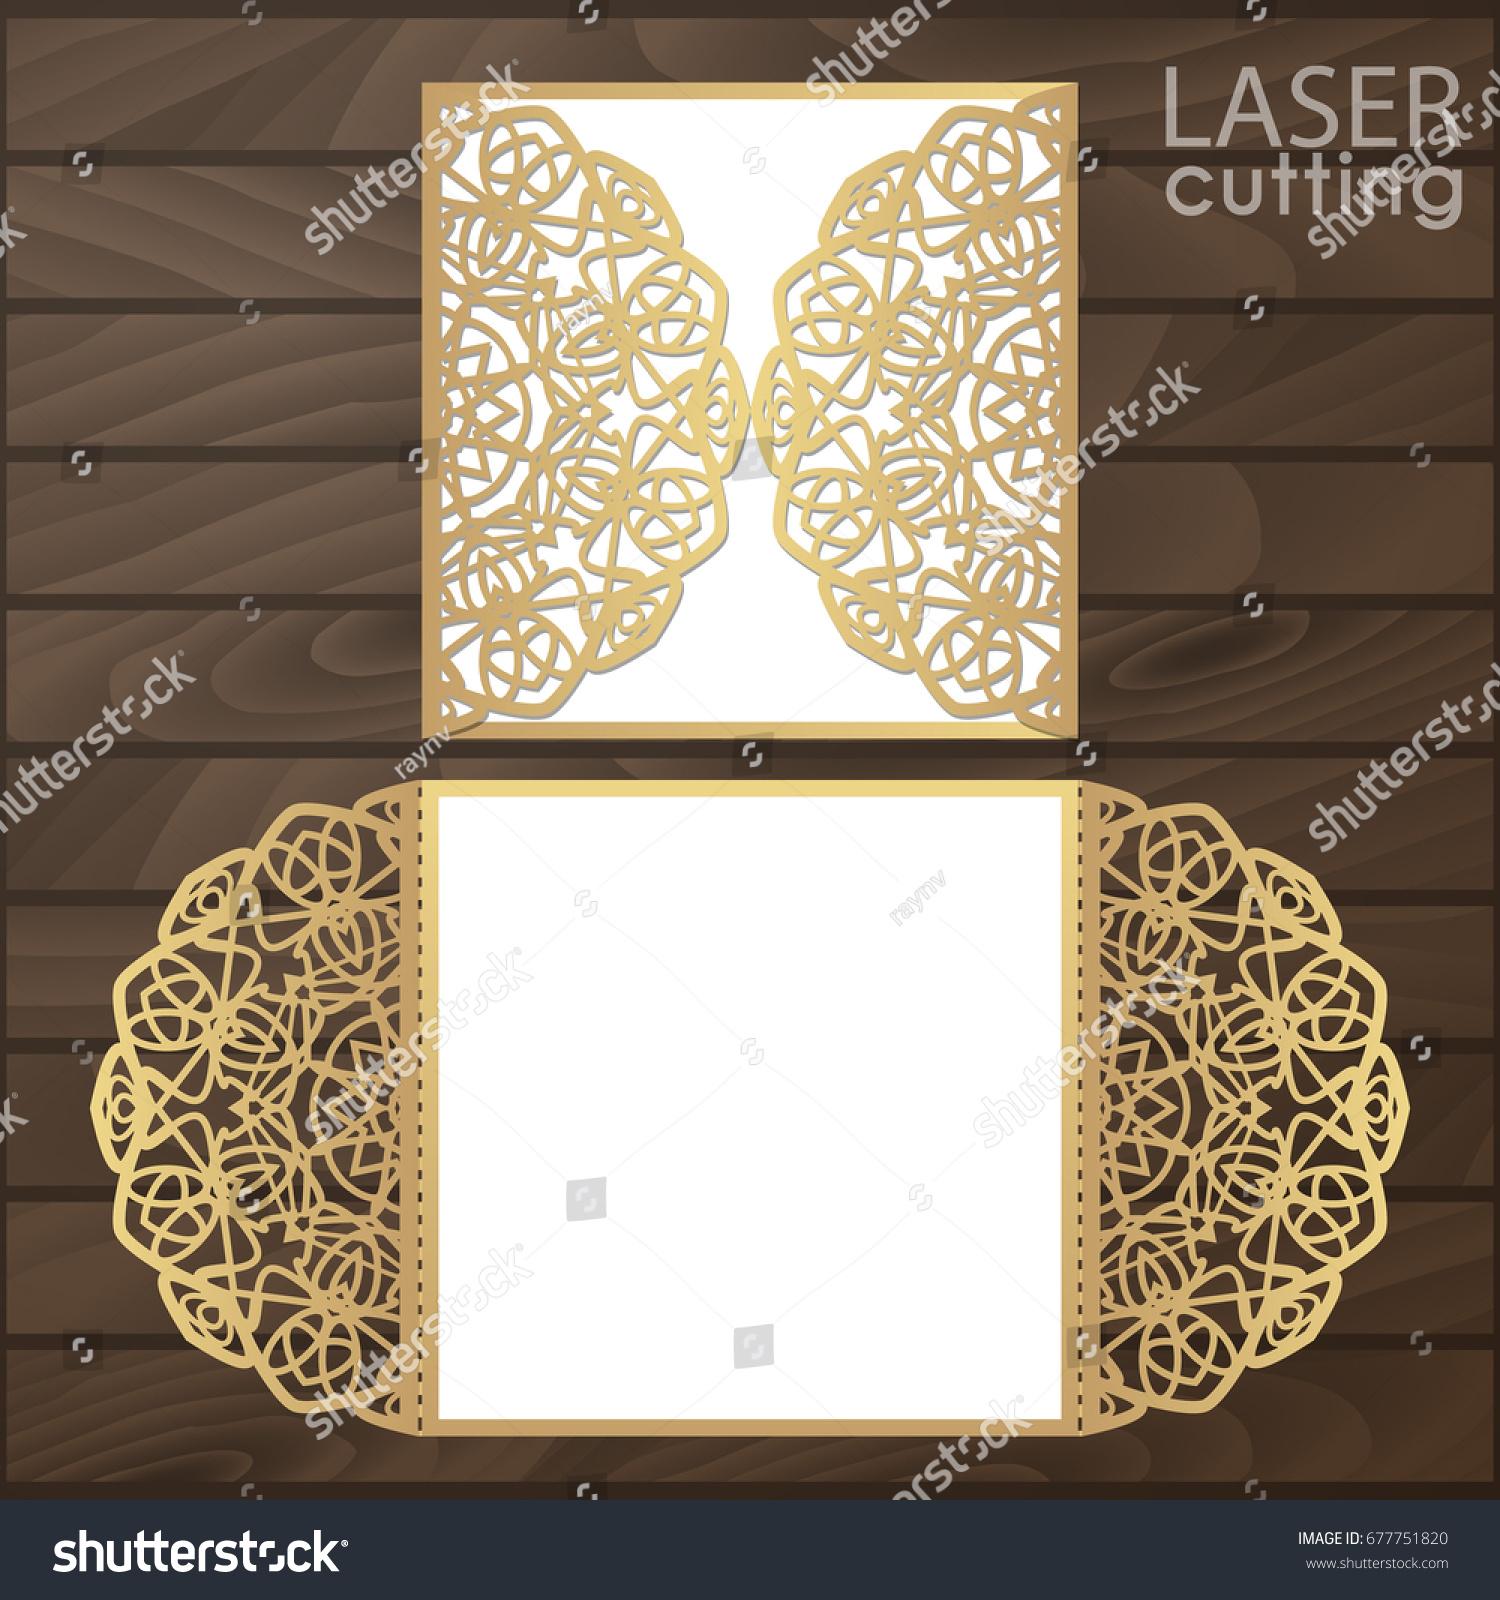 Laser Cut Wedding Invitation Card Template Stock Vector HD (Royalty ...